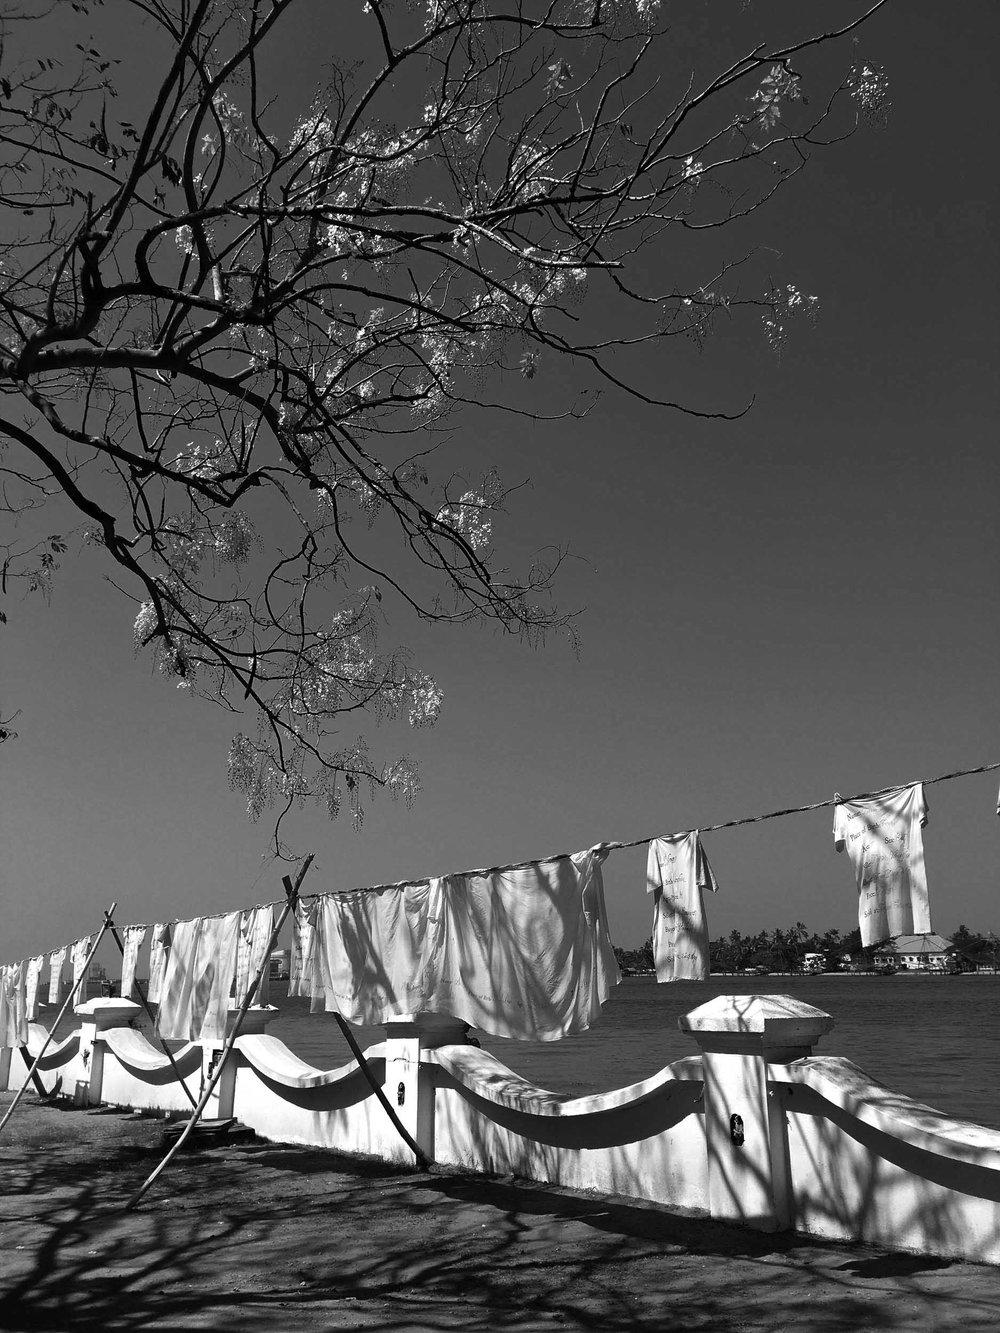 Sindhur_Photography_Kochi Muziris Biennale -2019-36.JPG